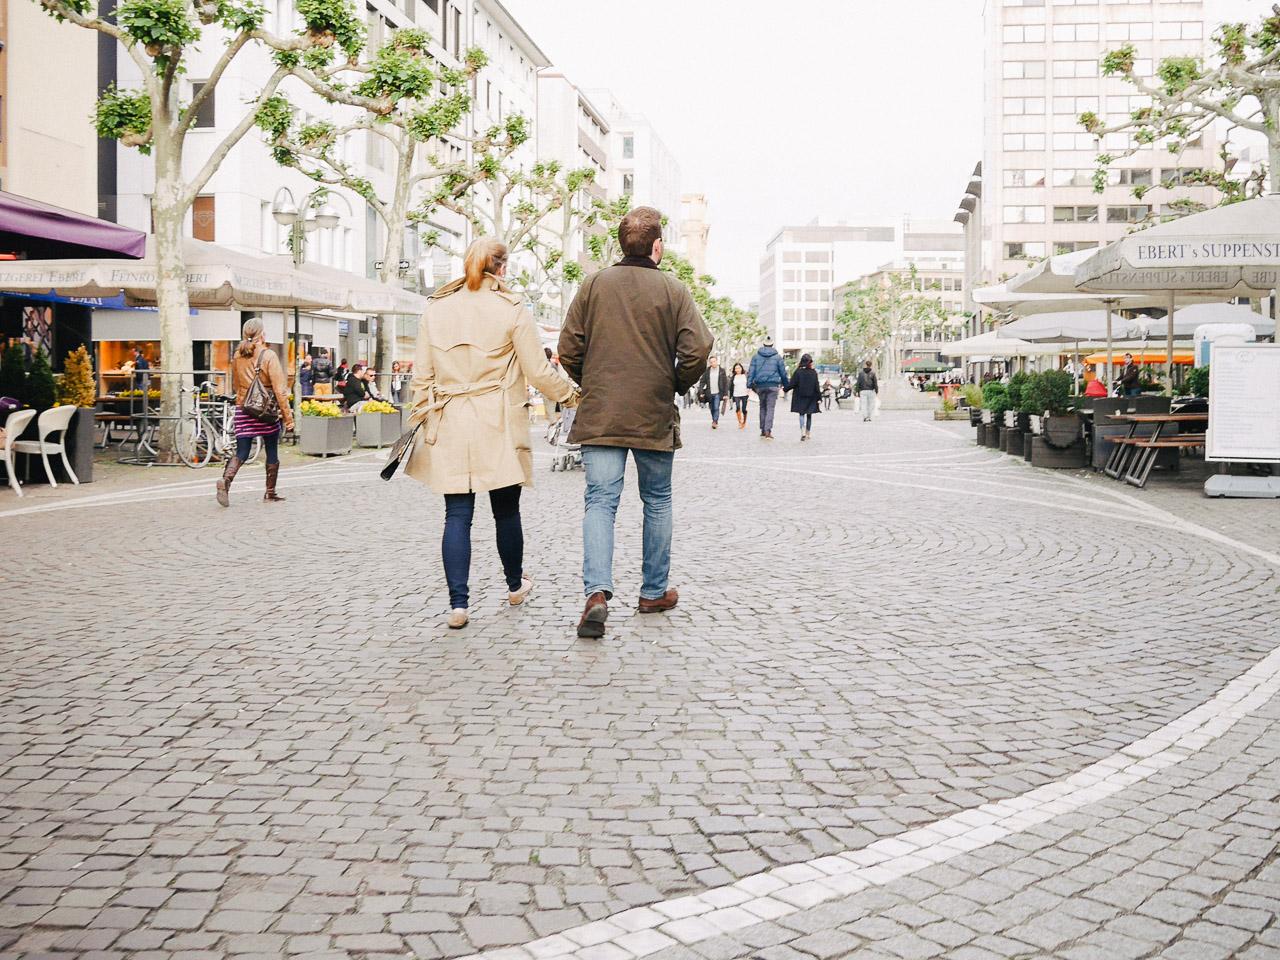 Trip to Germany & France【2】 – ドイツ・フランクフルトの街